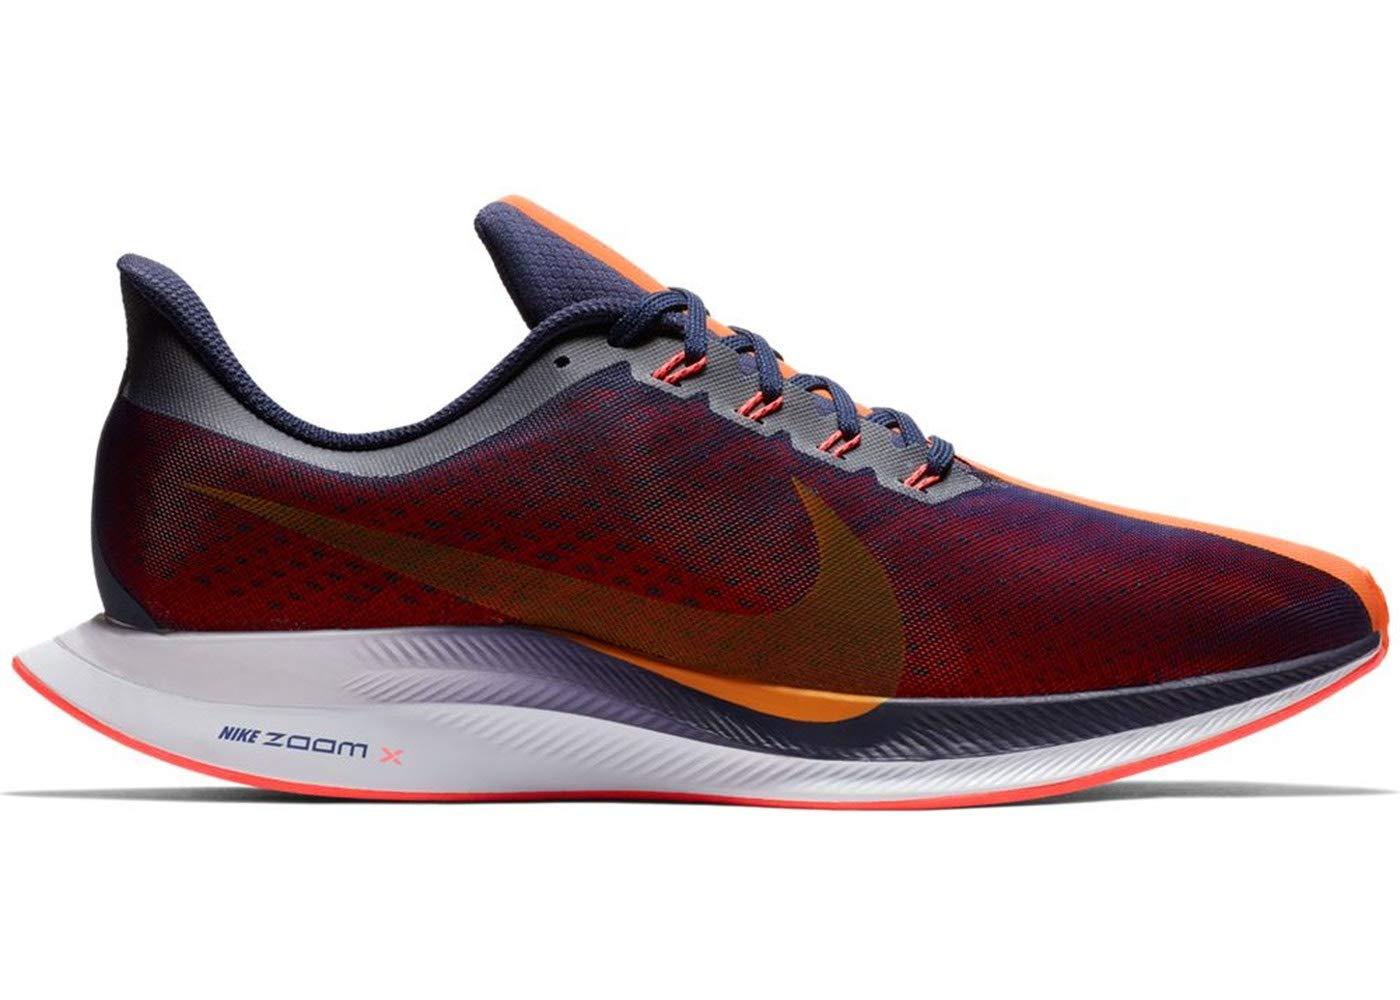 f88ef2e3723c8 Galleon - NIKE Men s Air Zoom Pegasus 35 Turbo Running Shoes (13 ...